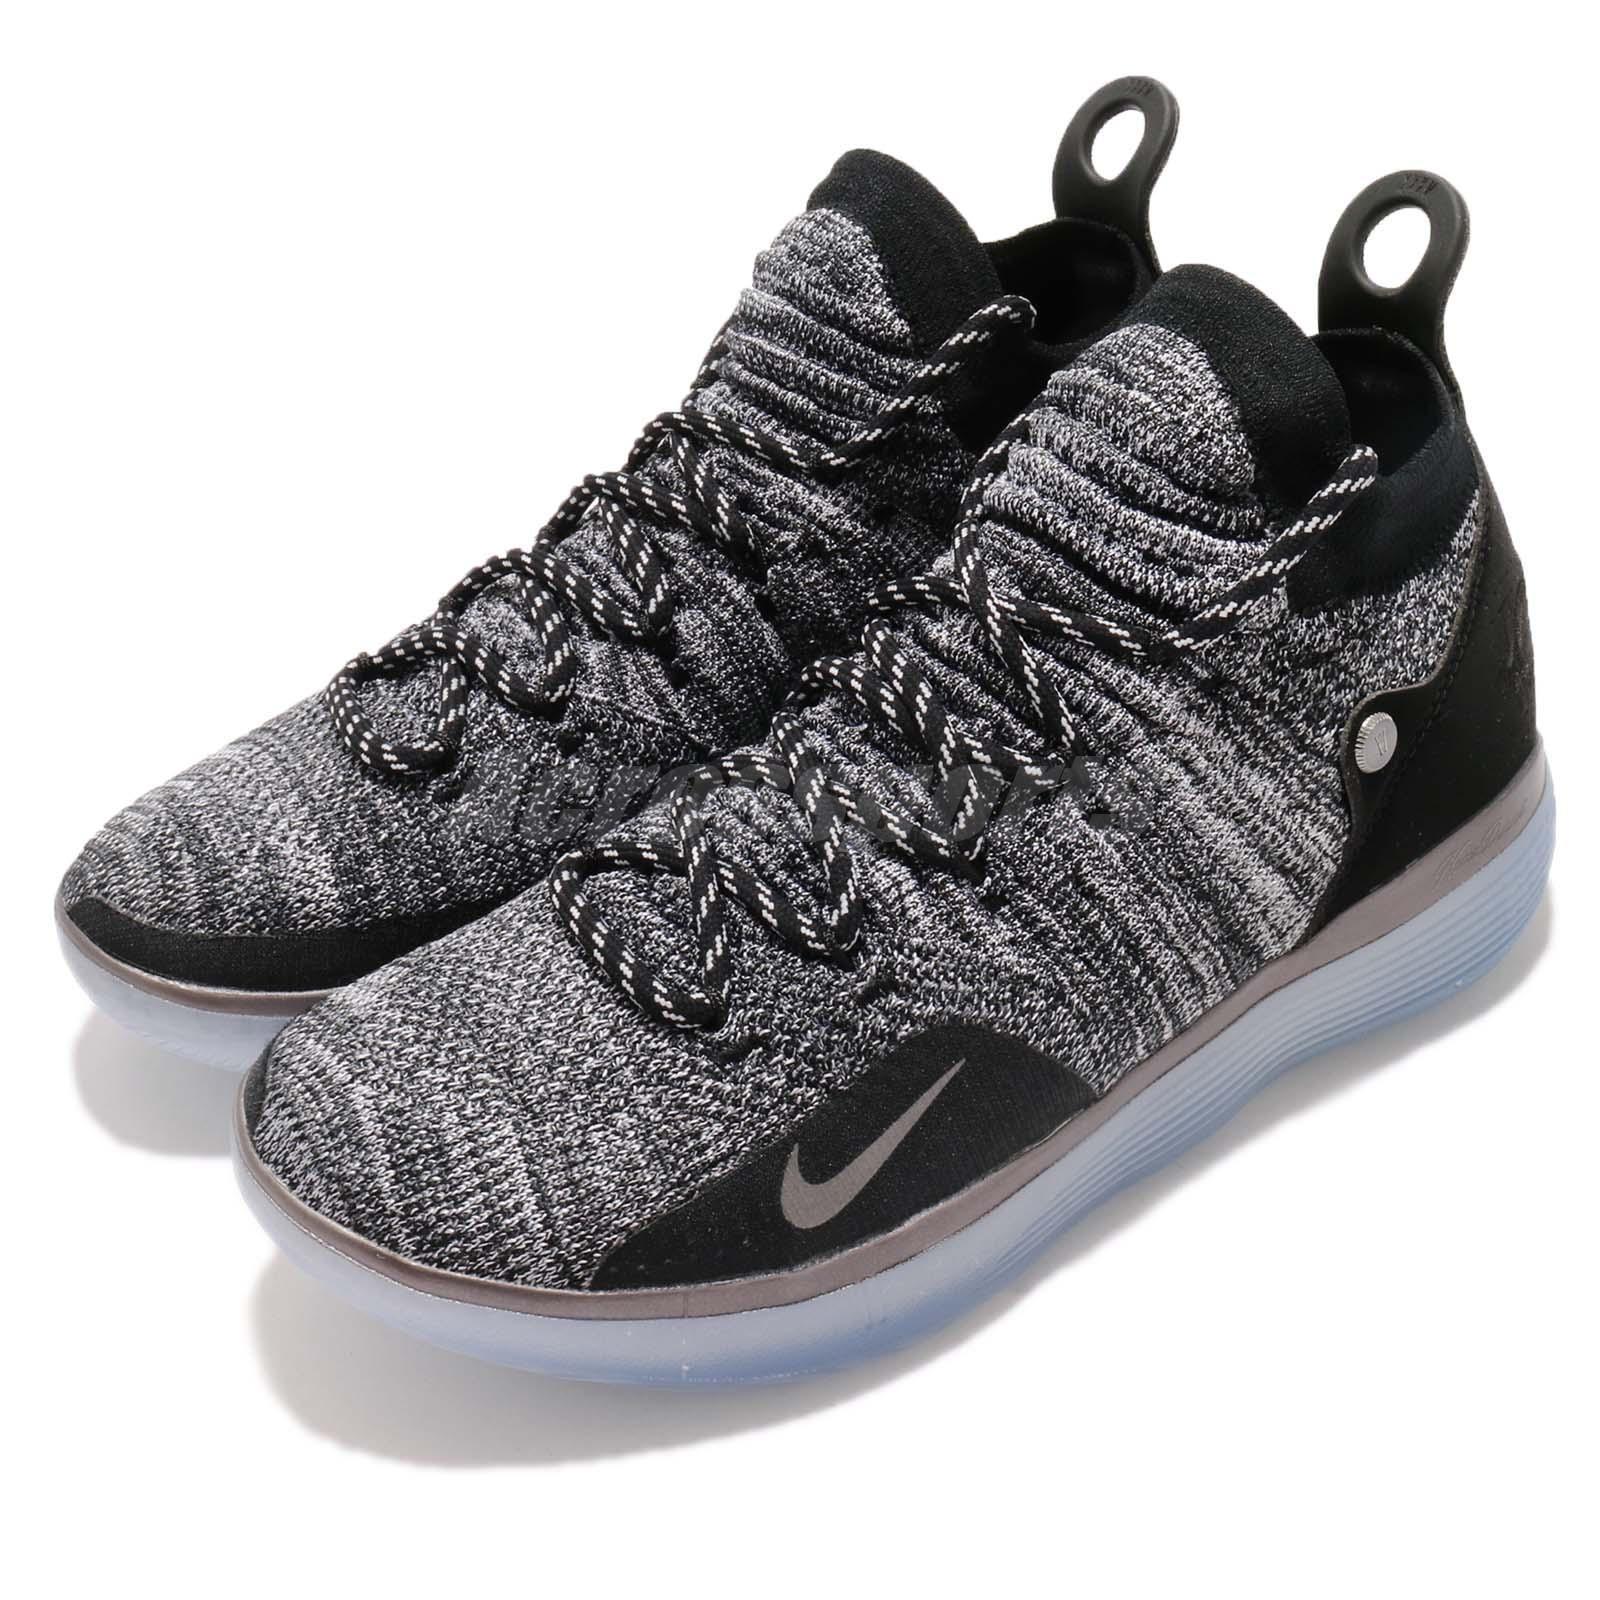 Nike Zoom KD 11 EP Still KD Black Grey Kevin Durant Basketball shoes AO2605-004